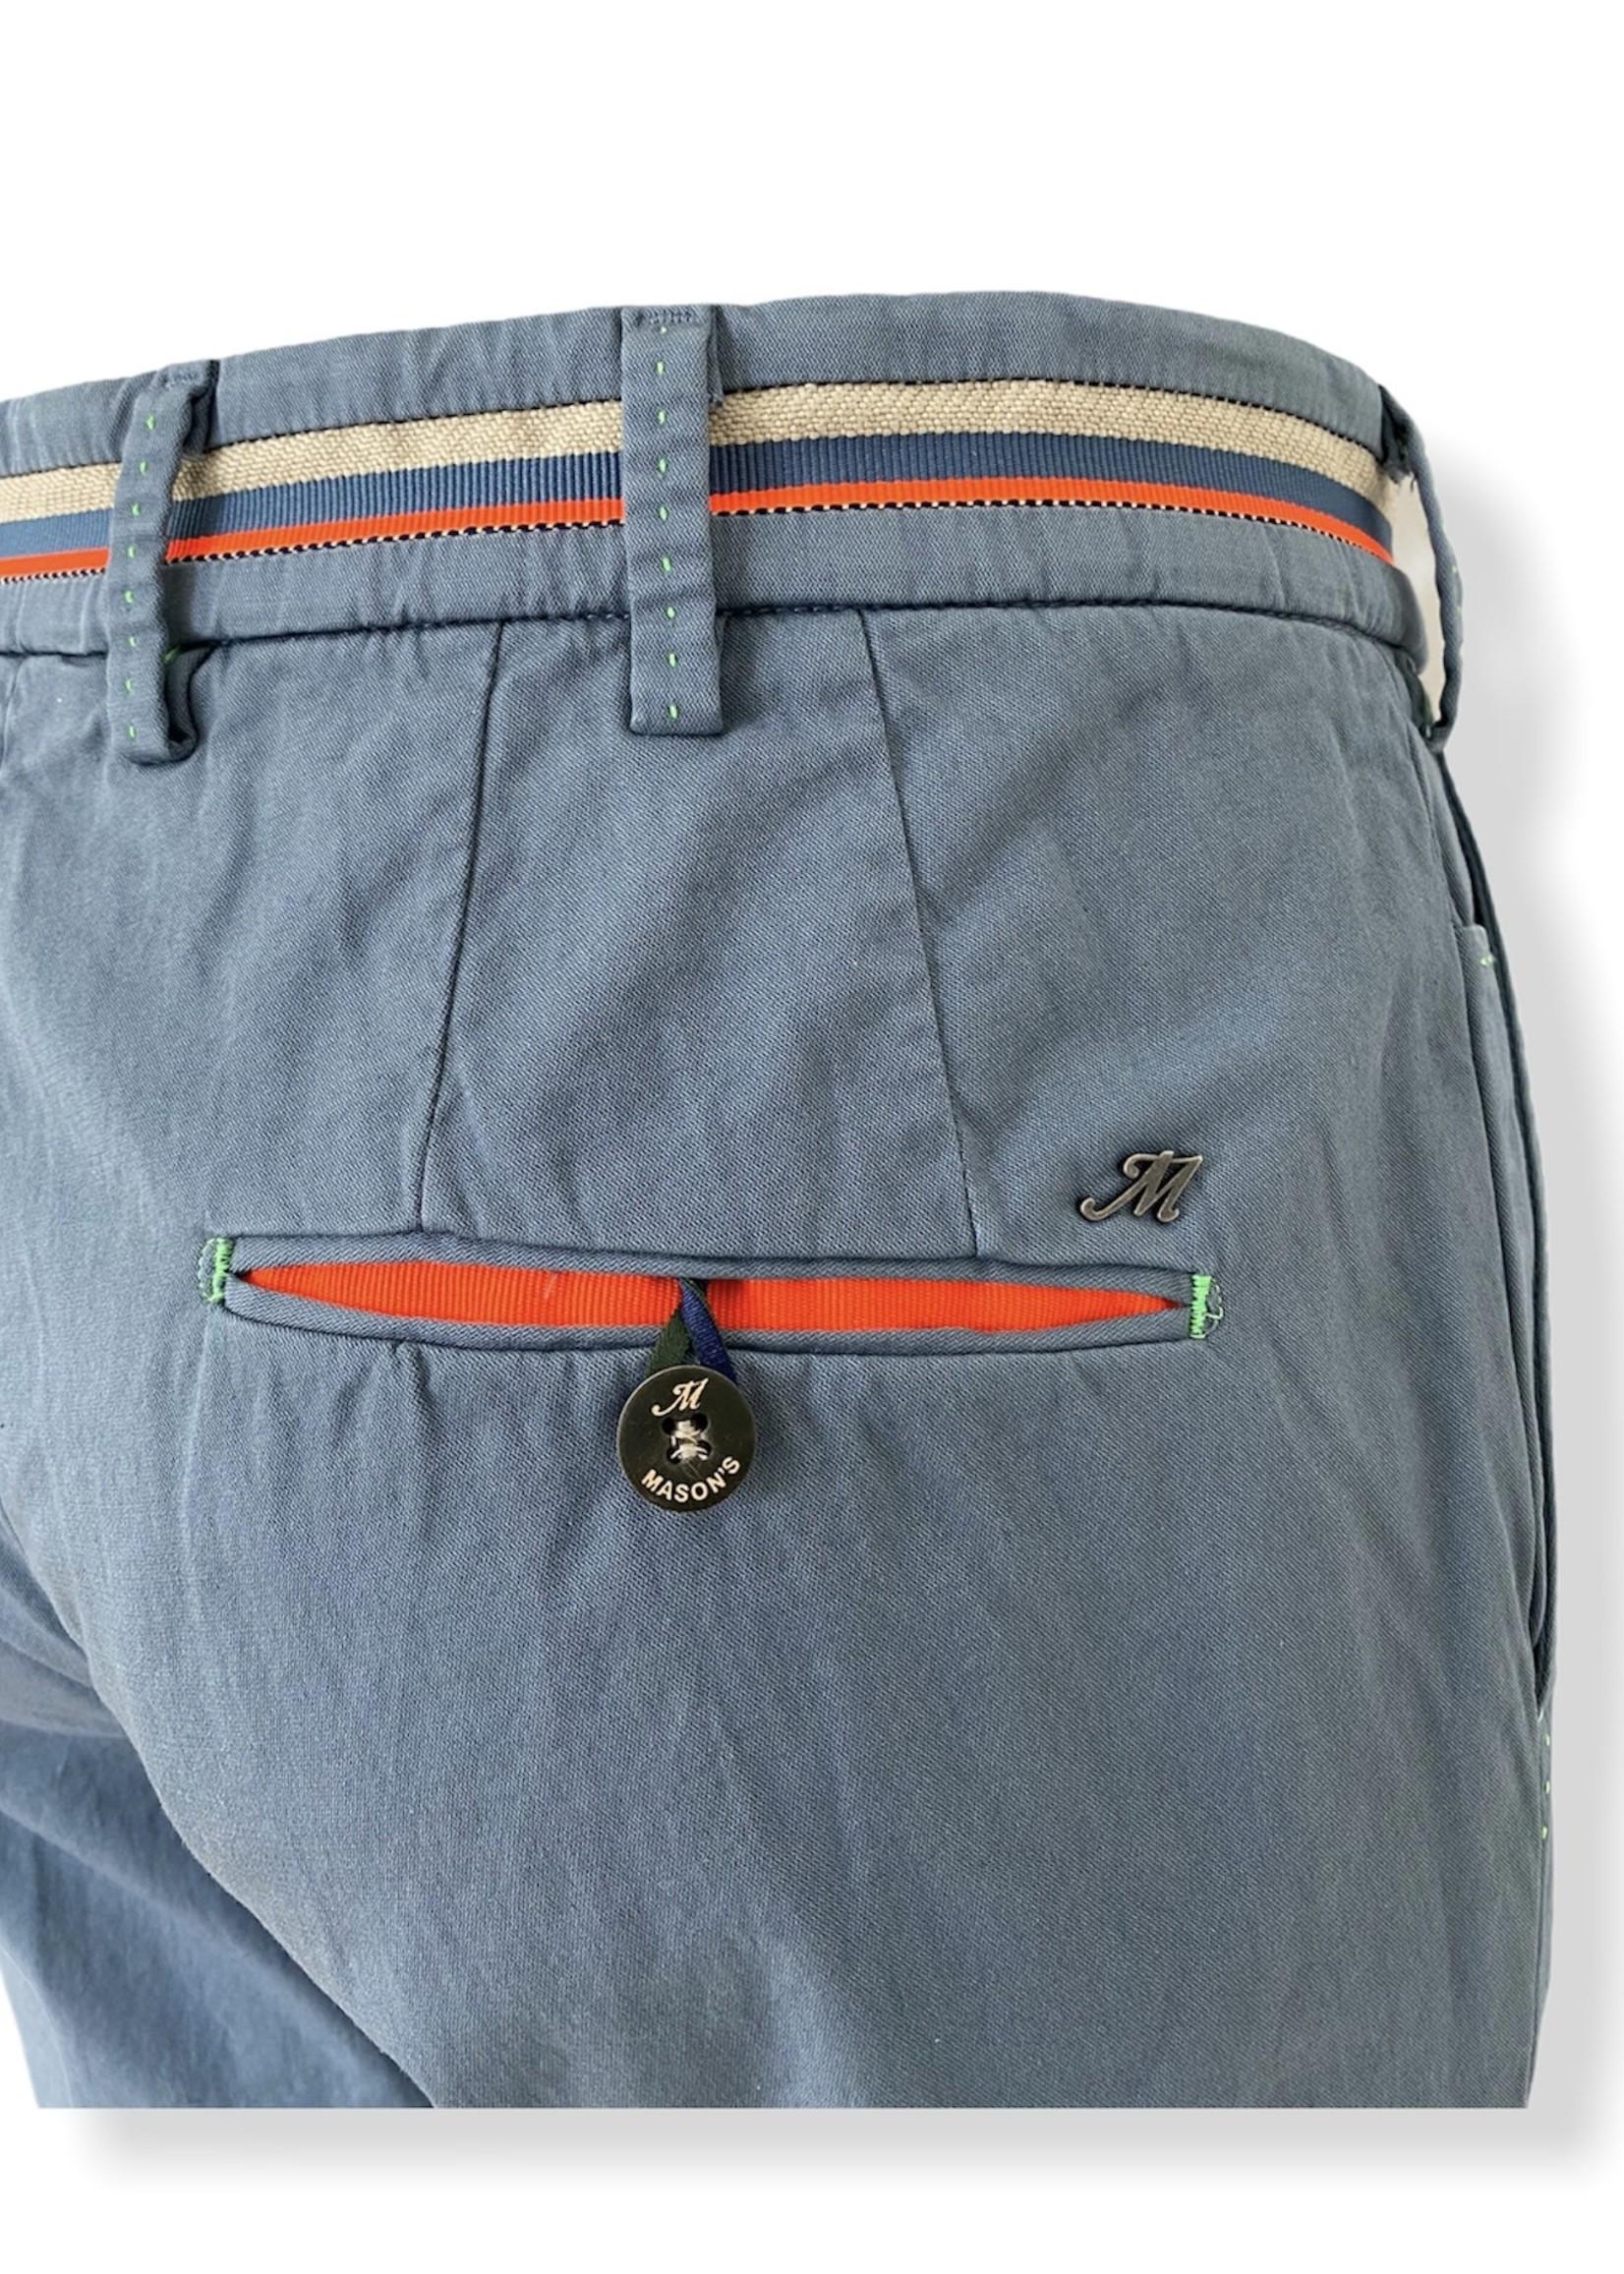 Mason's Milano Start extra slim fit stretch satijnen broek | Hemelsblauw | Mason's